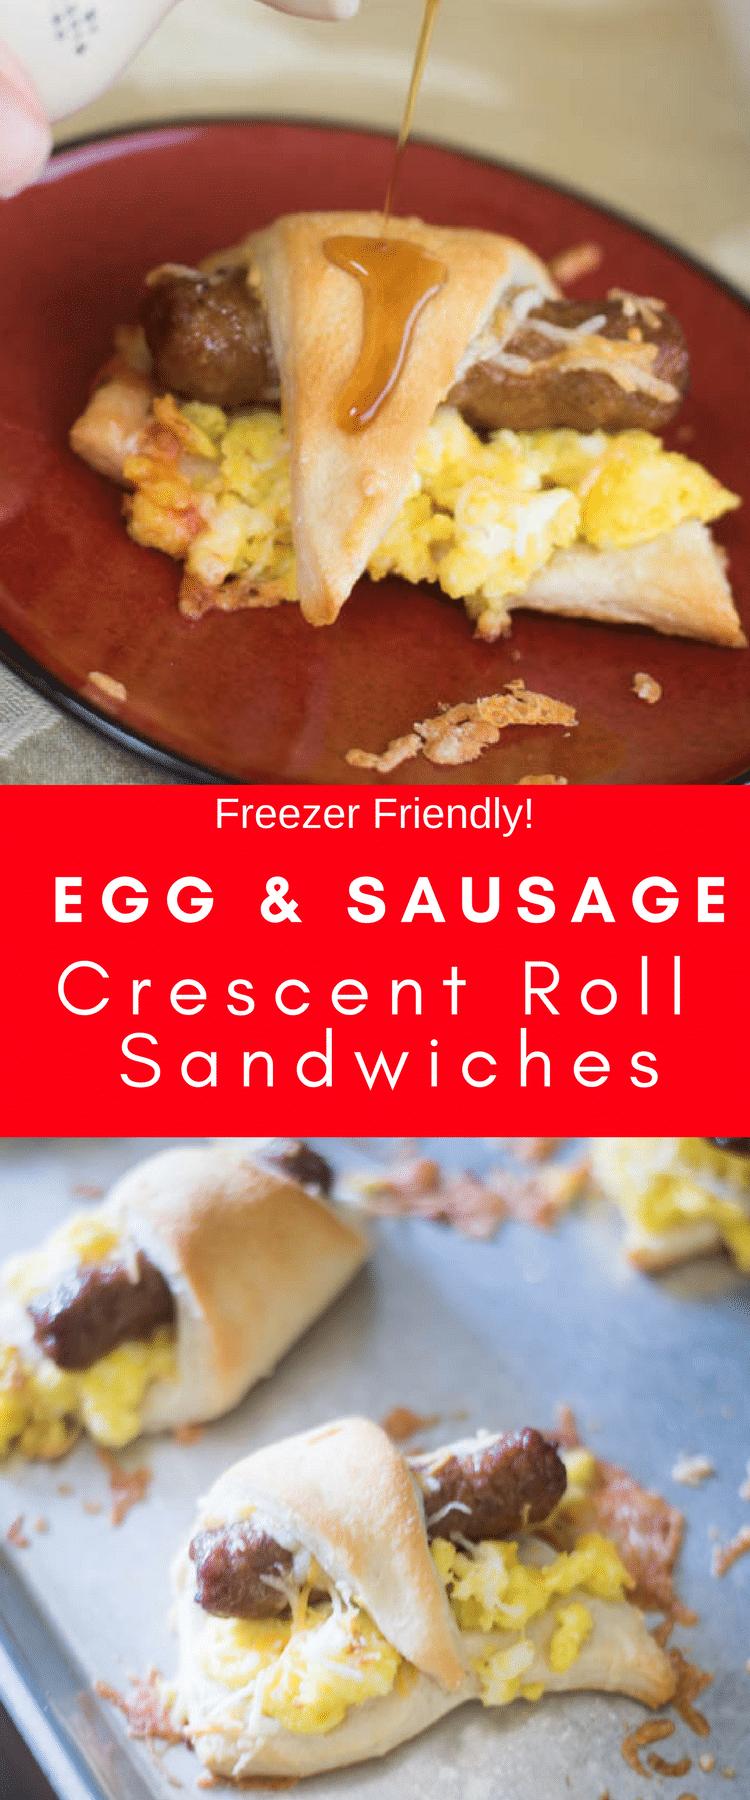 Sausage Breakfast Sandwich / Crescent Roll Recipes / Freezer Breakfast / Freezer Meals / Back to School / Breakfast / Easy Breakfast / #breakfast #sausage #backtoschool #easyrecipe via @clarkscondensed